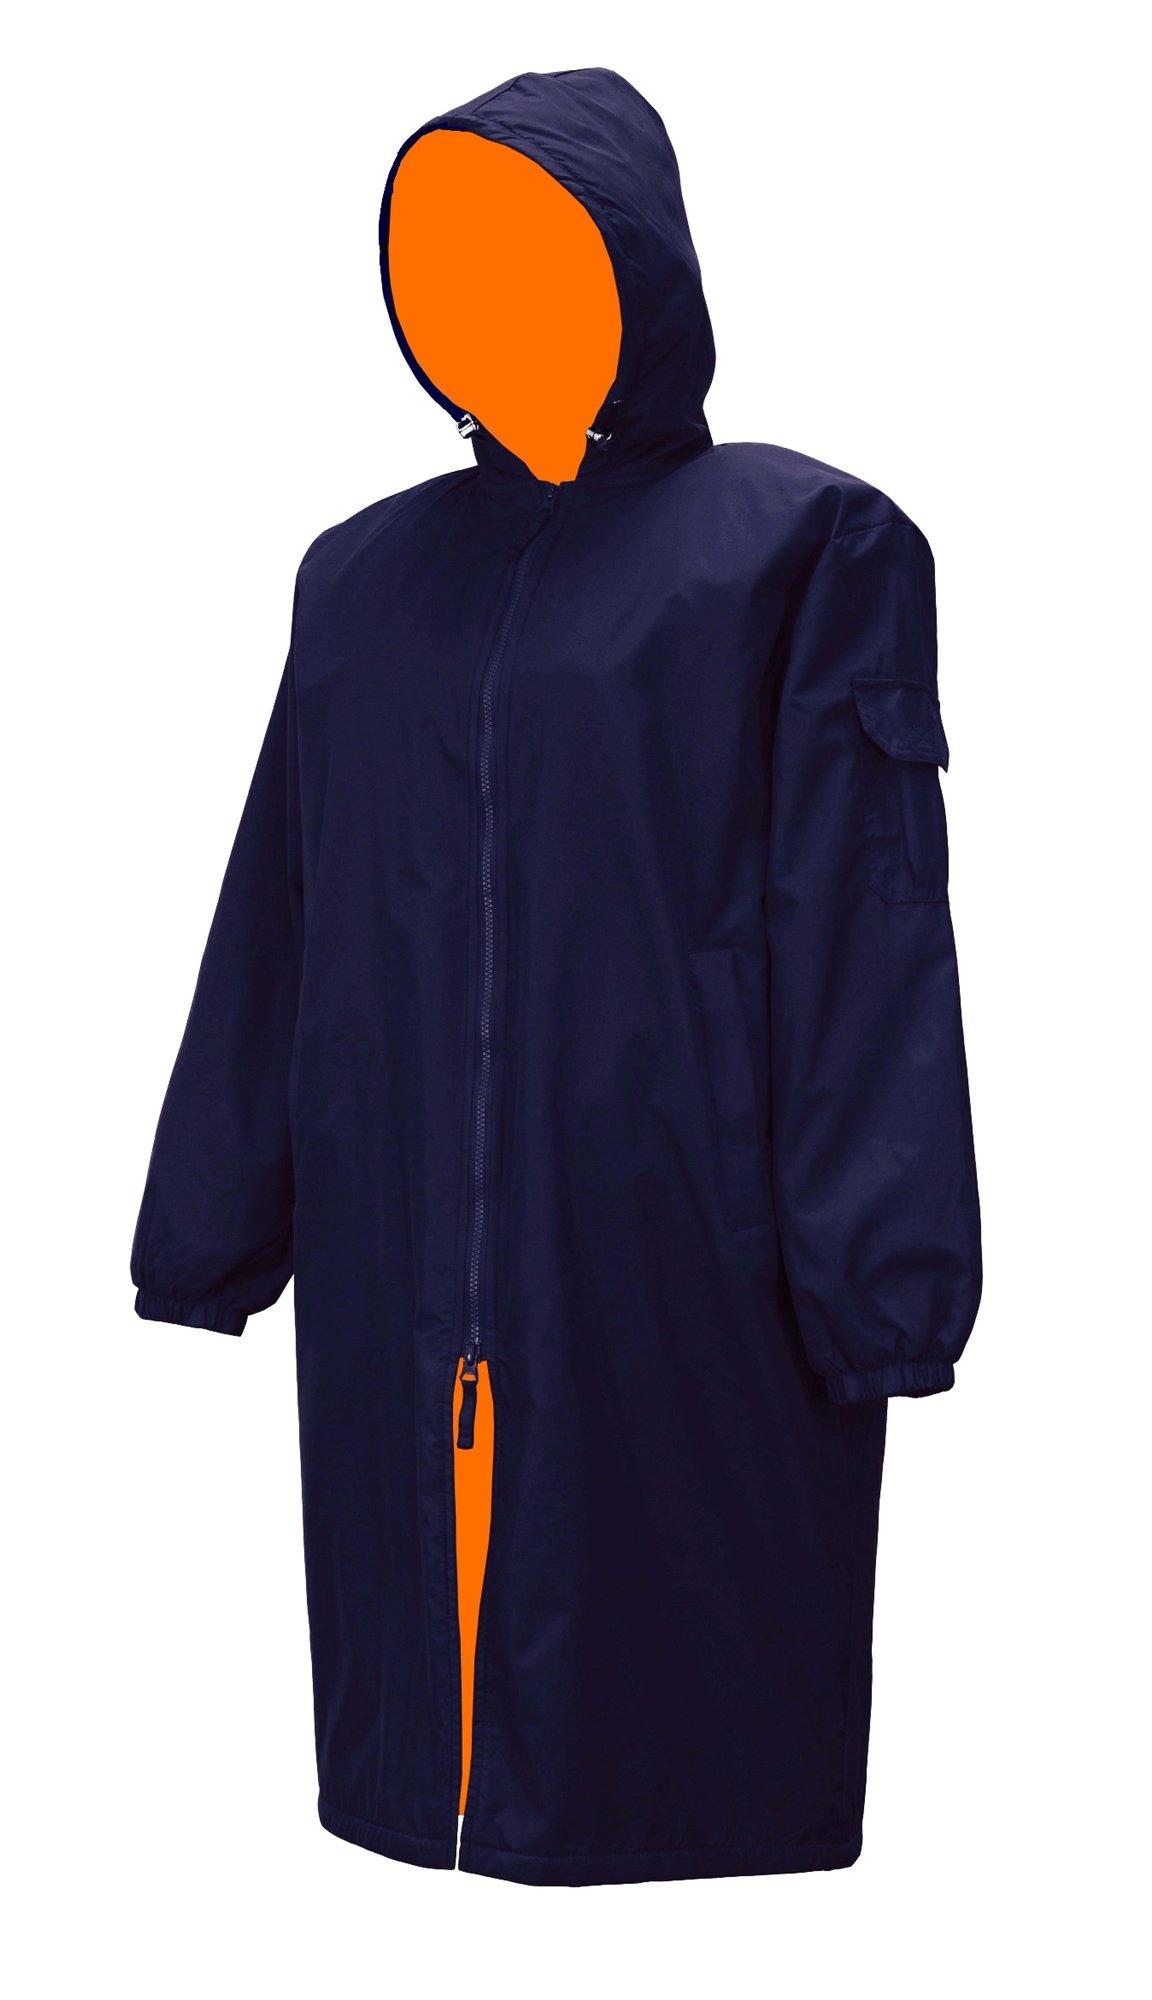 Adoretex Unisex Swim Parka (PK005C) - Navy/Orange - Youth-M